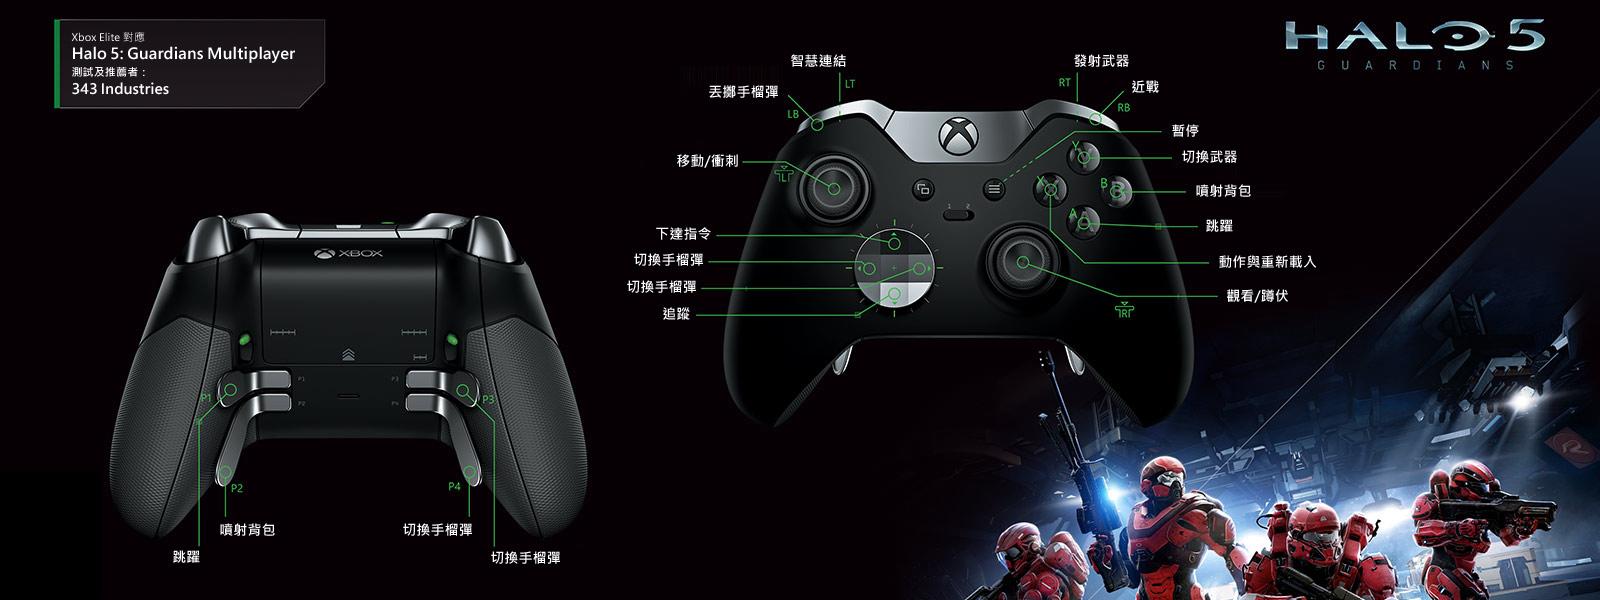 Halo 5 – Guardians Multiplayer Elite 配對功能